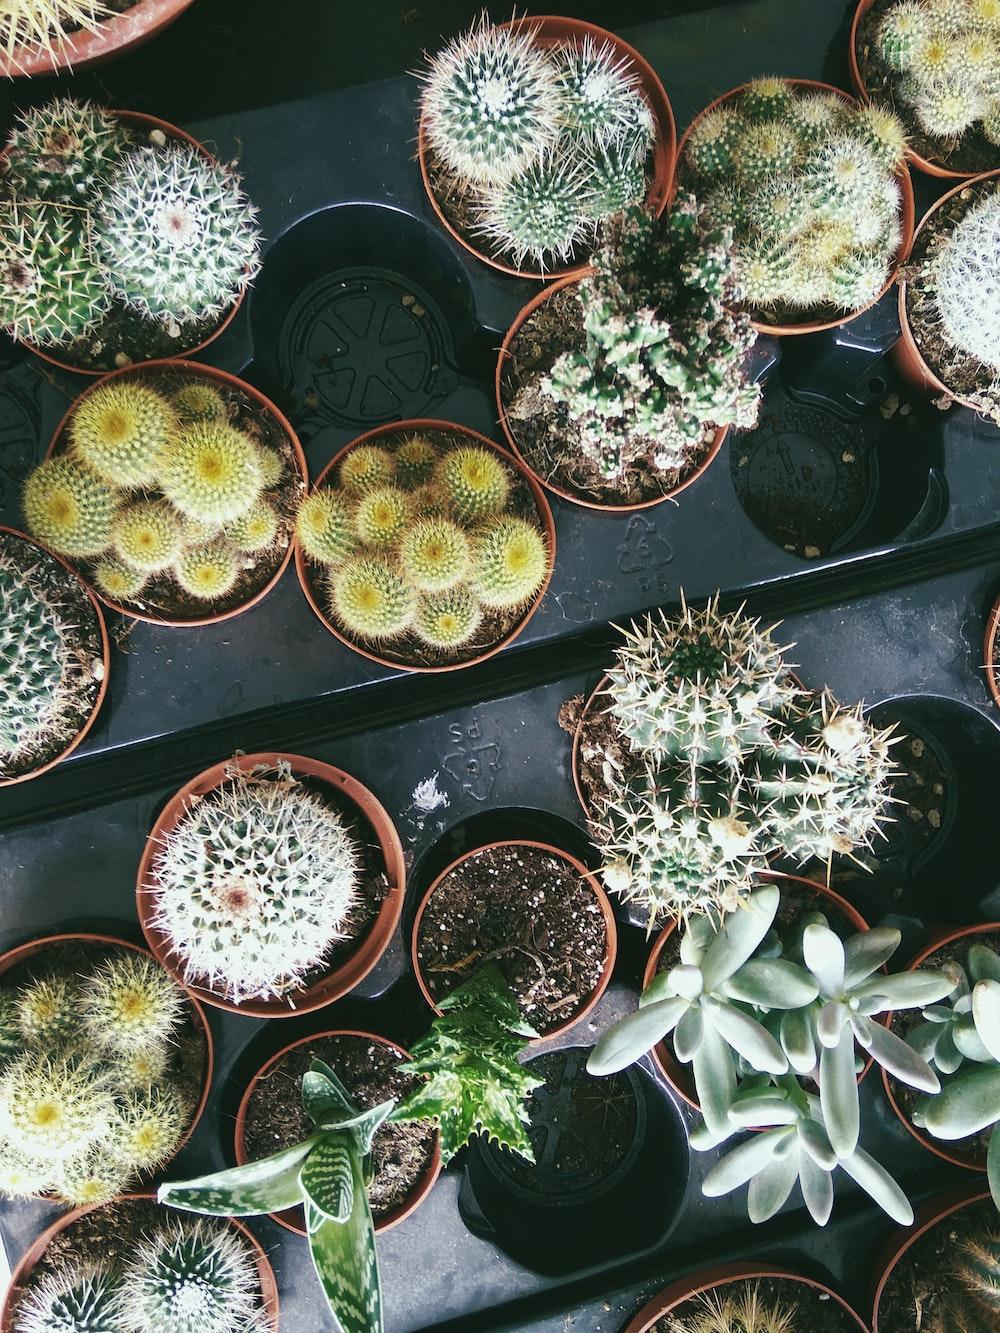 green cactus plants on black plastic pots